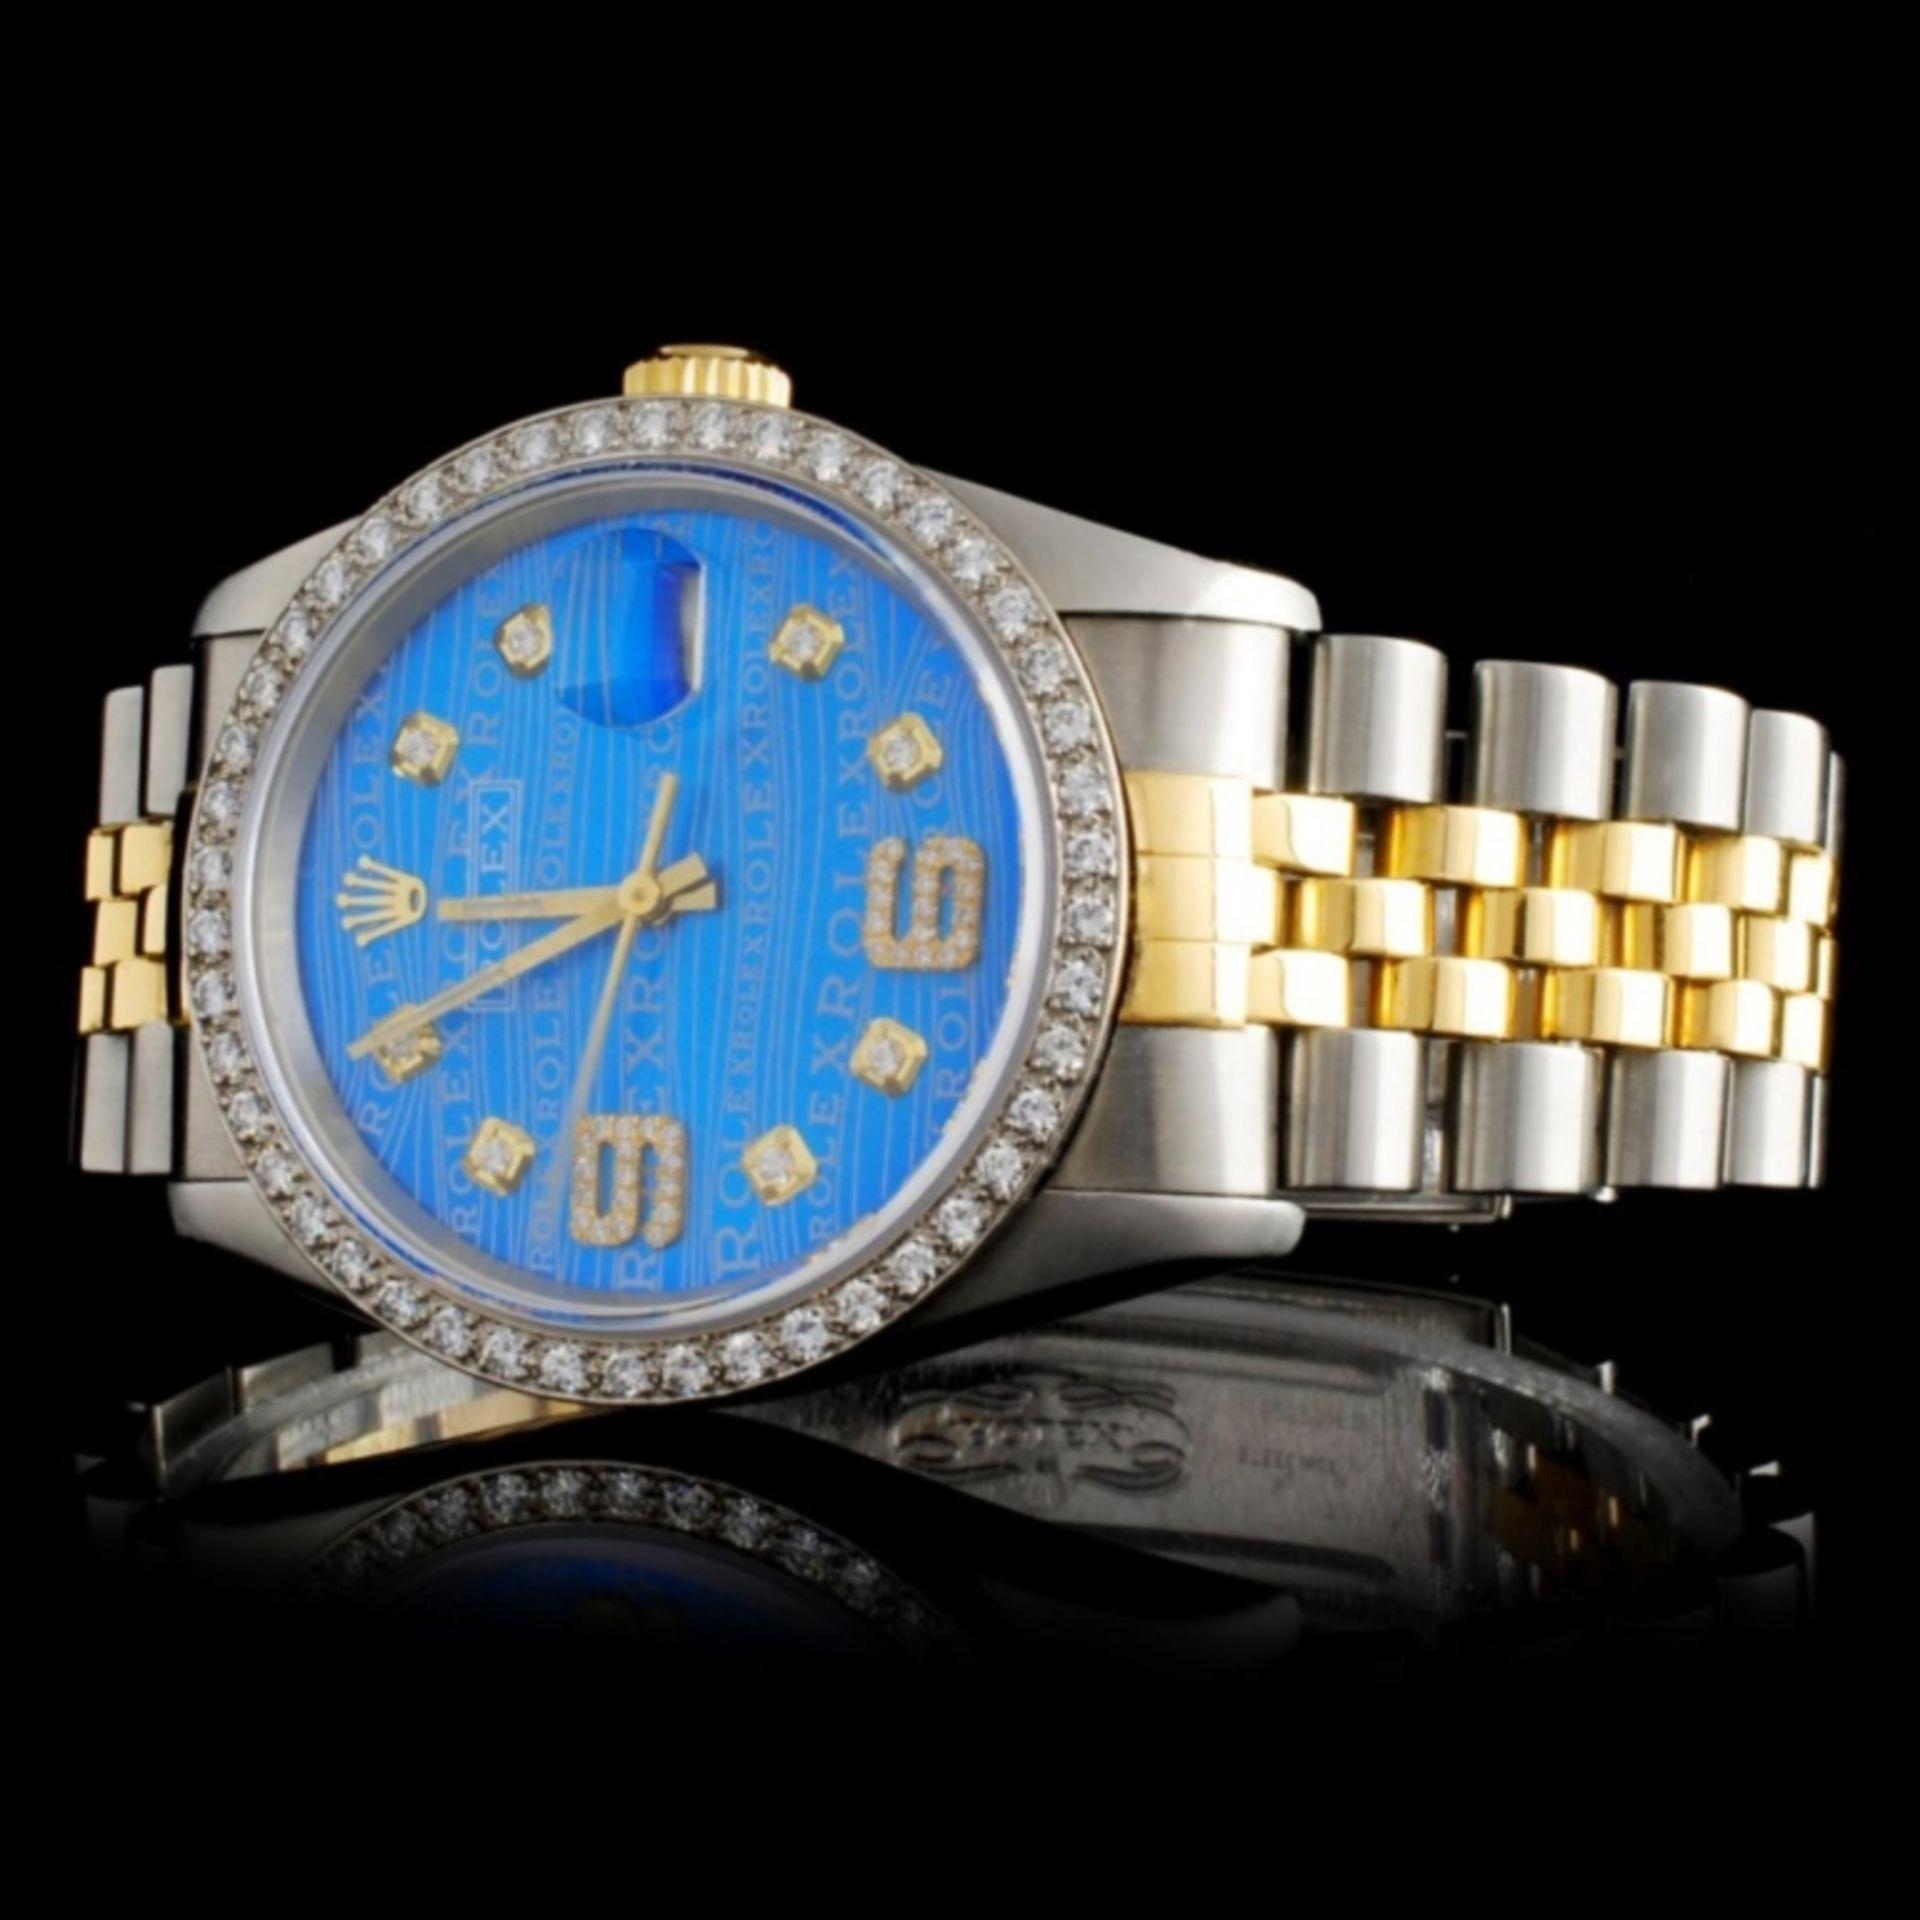 Rolex YG/SS DateJust Diam 36MM Wristwatch - Image 2 of 5